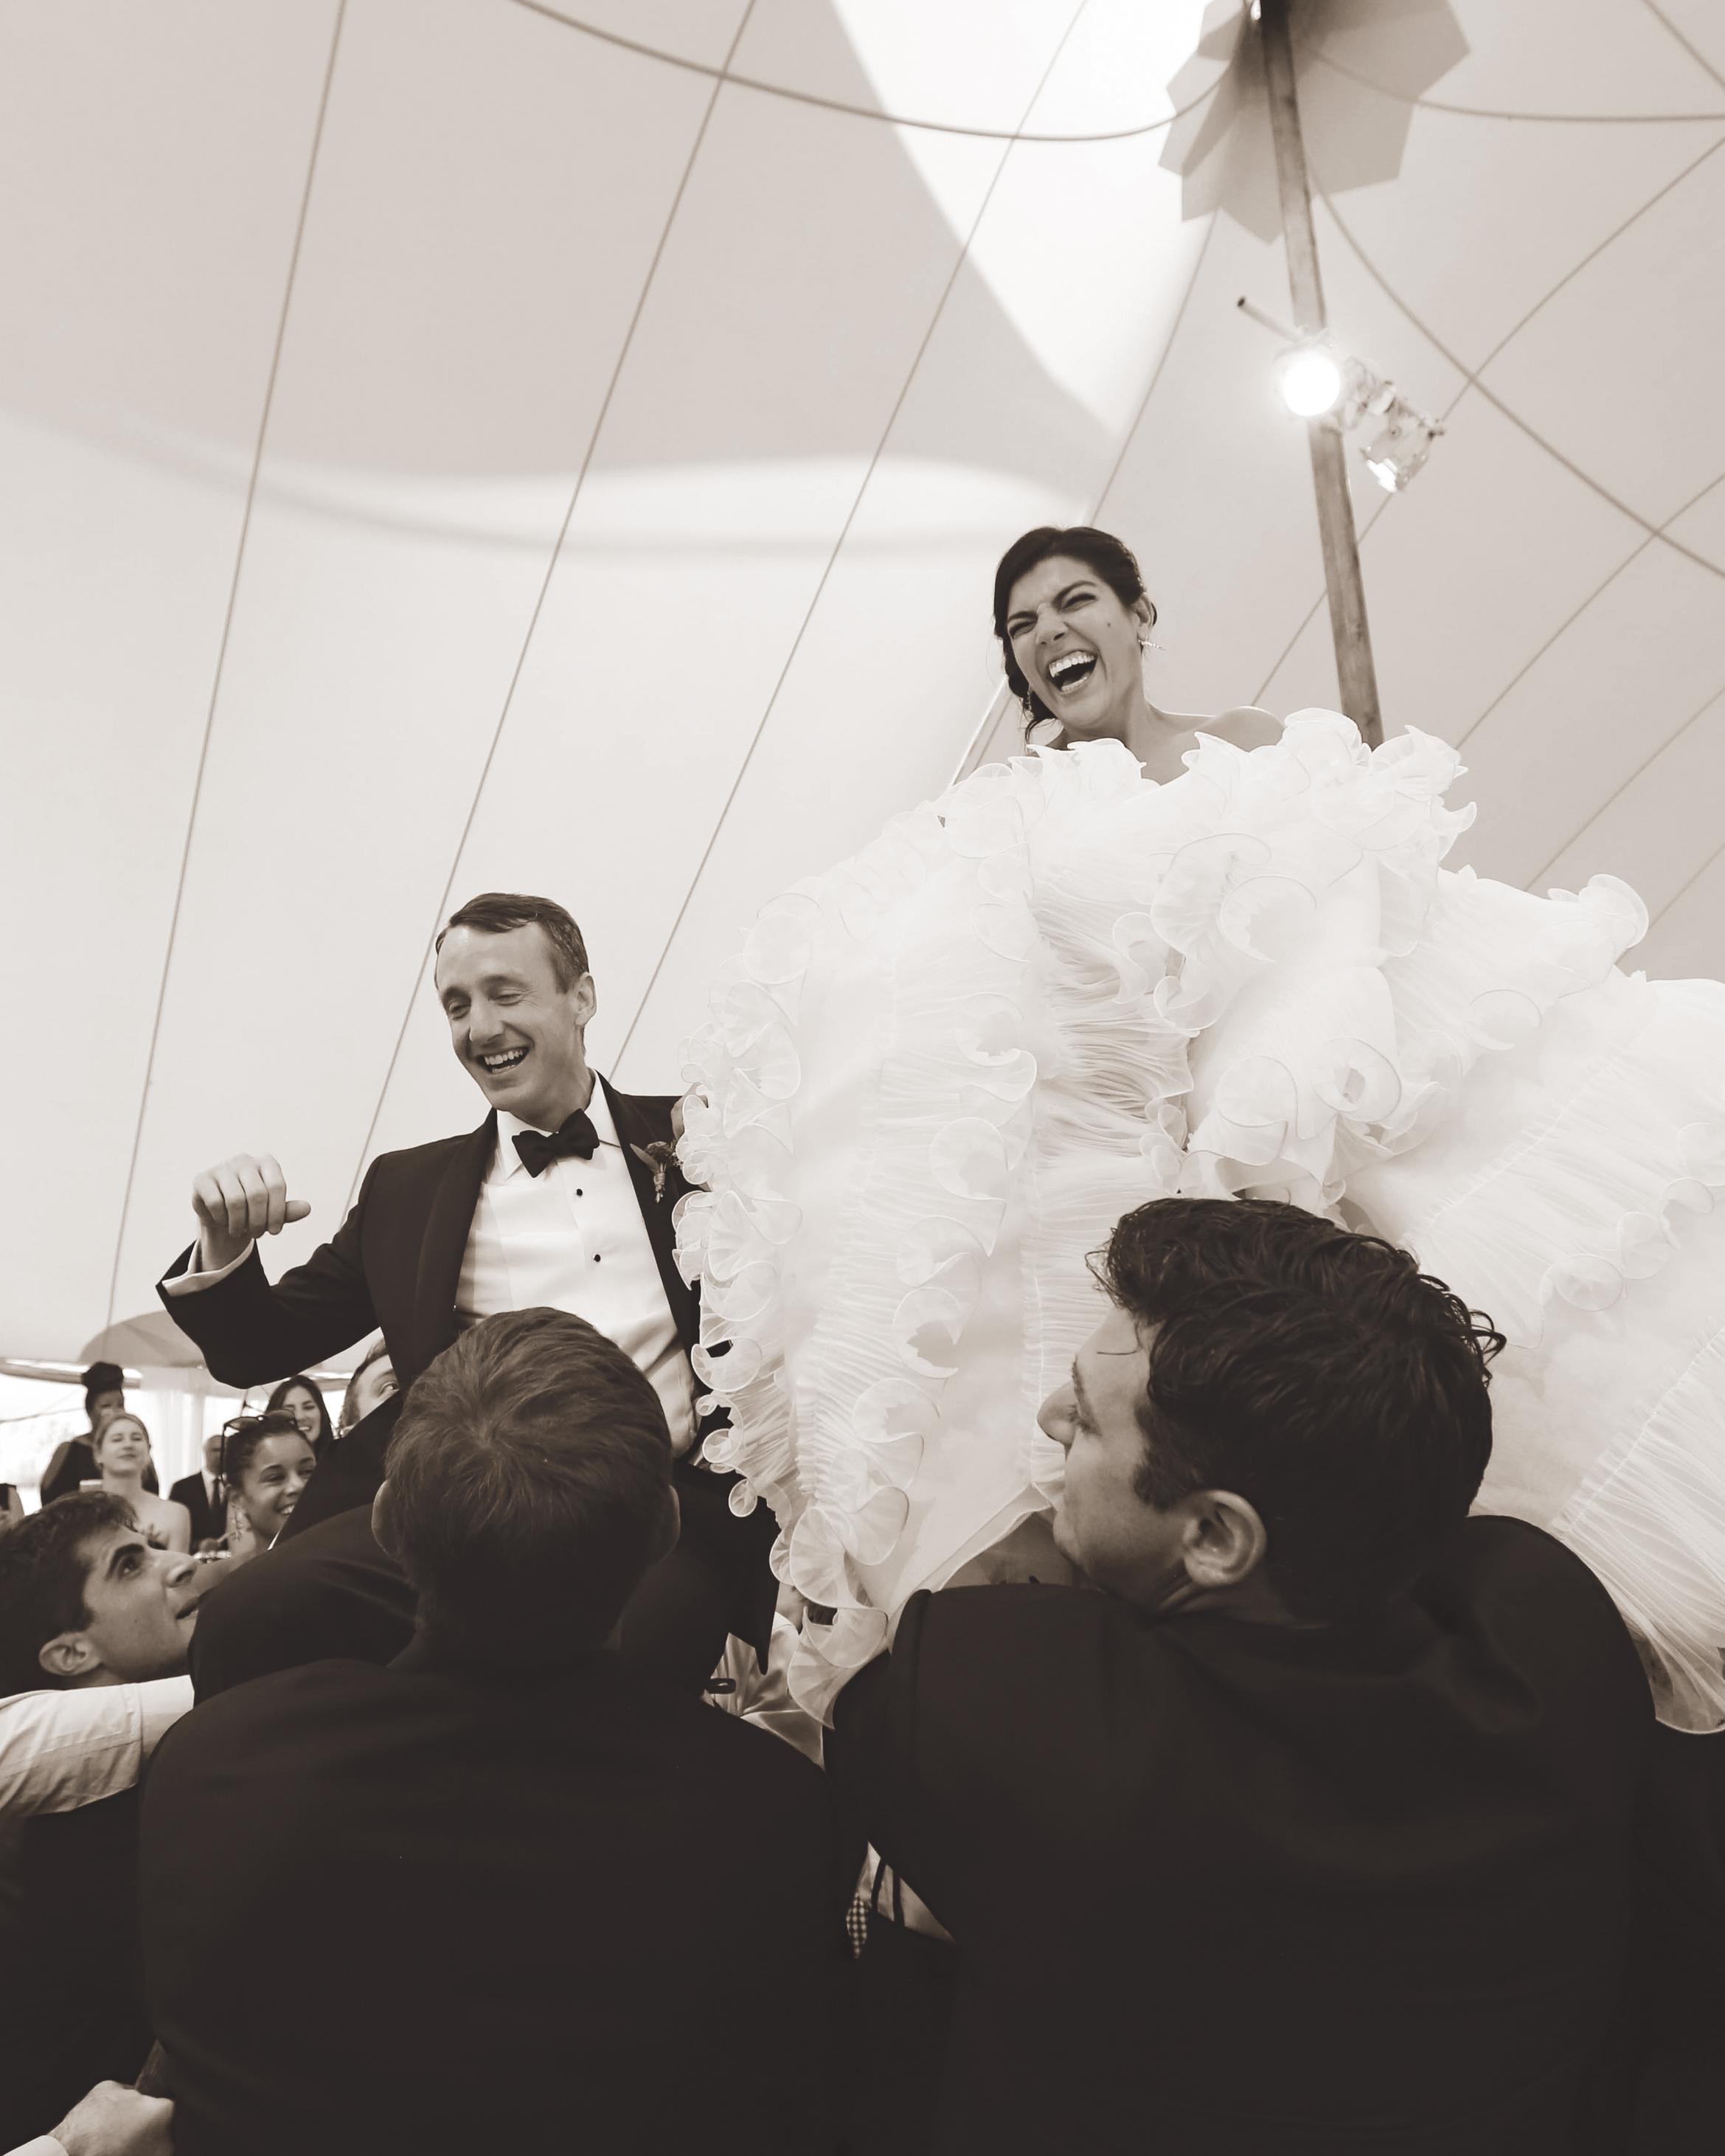 ali-andrew-wedding-wyoming-029-s111942-bw.jpg